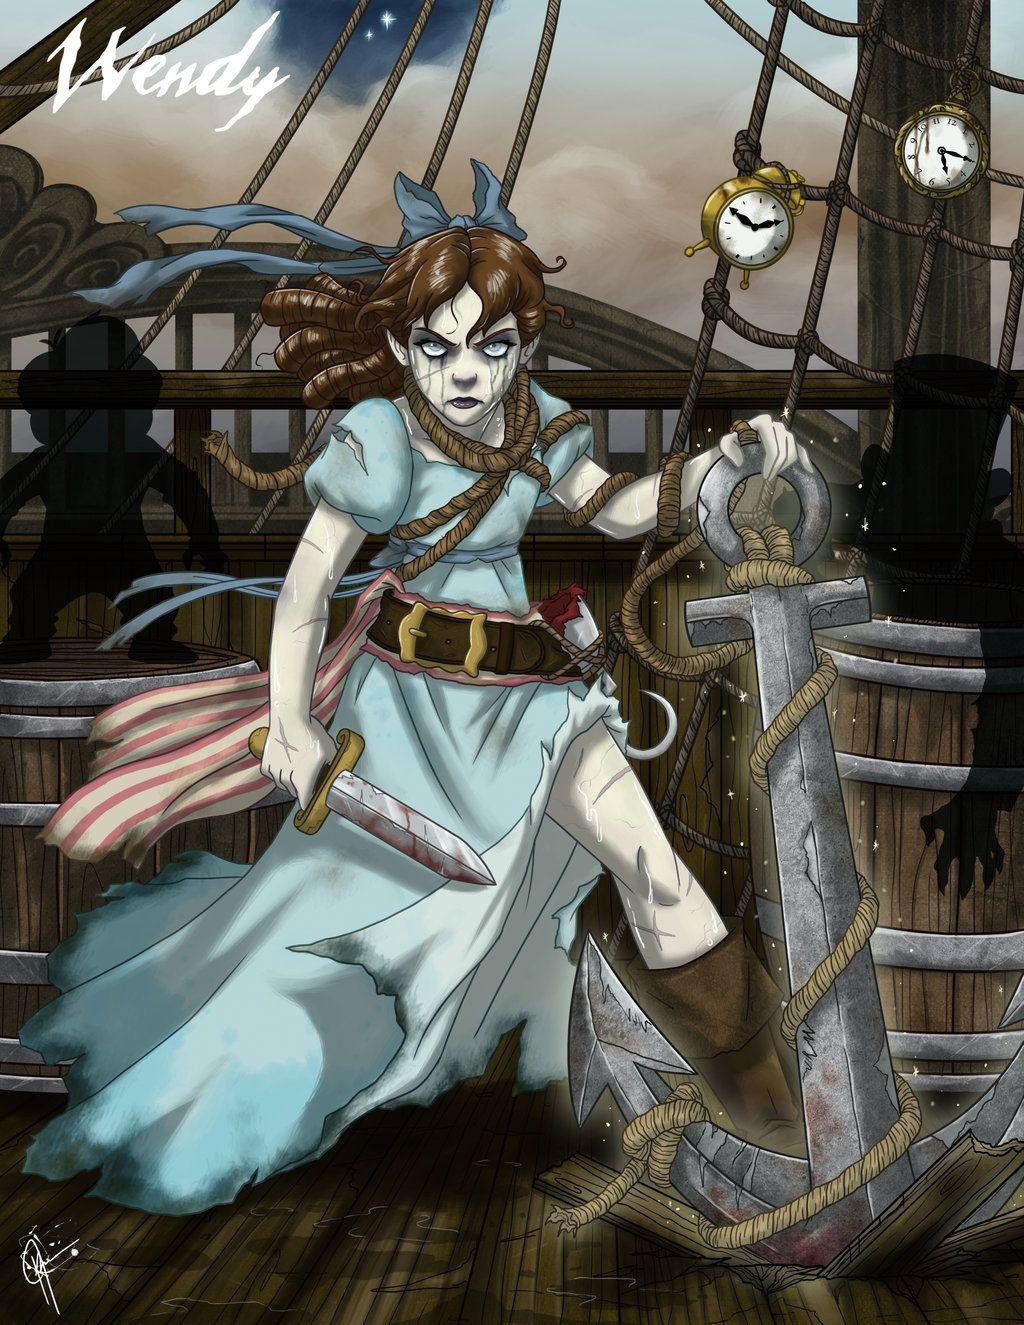 Image from http://fc02.deviantart.net/fs71/i/2012/191/5/e/twisted_princess__wendy_by_jeftoon01-d56pb89.jpg.